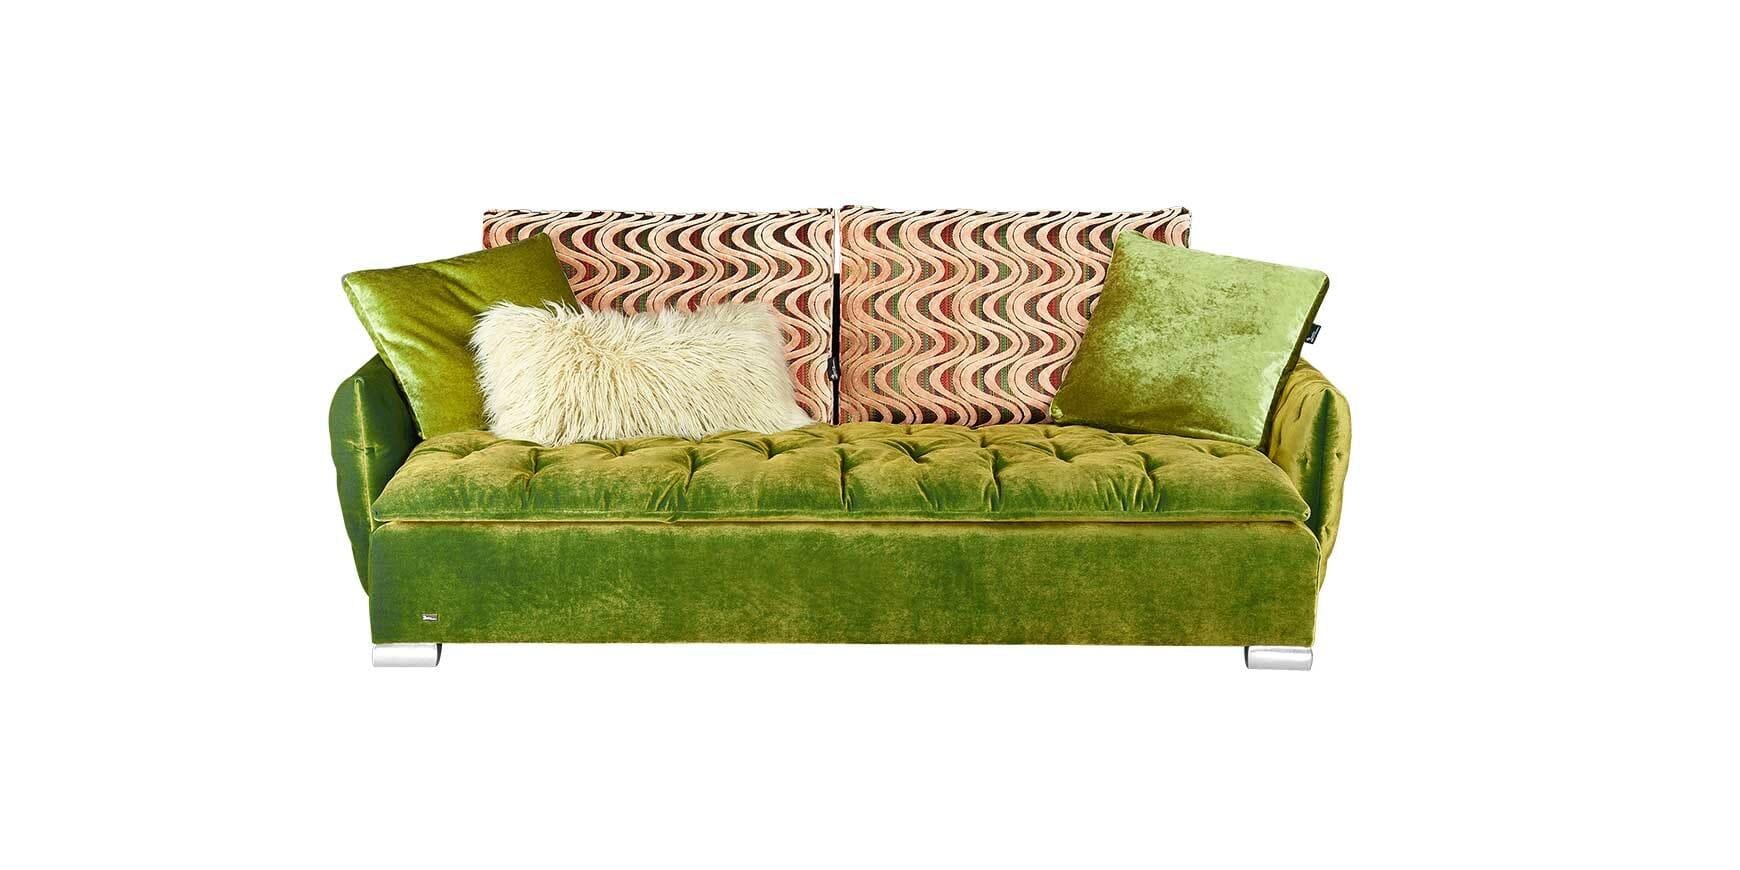 bretz filousof ylr 112 4 sitzer top angebote an bretz filousof sofas. Black Bedroom Furniture Sets. Home Design Ideas